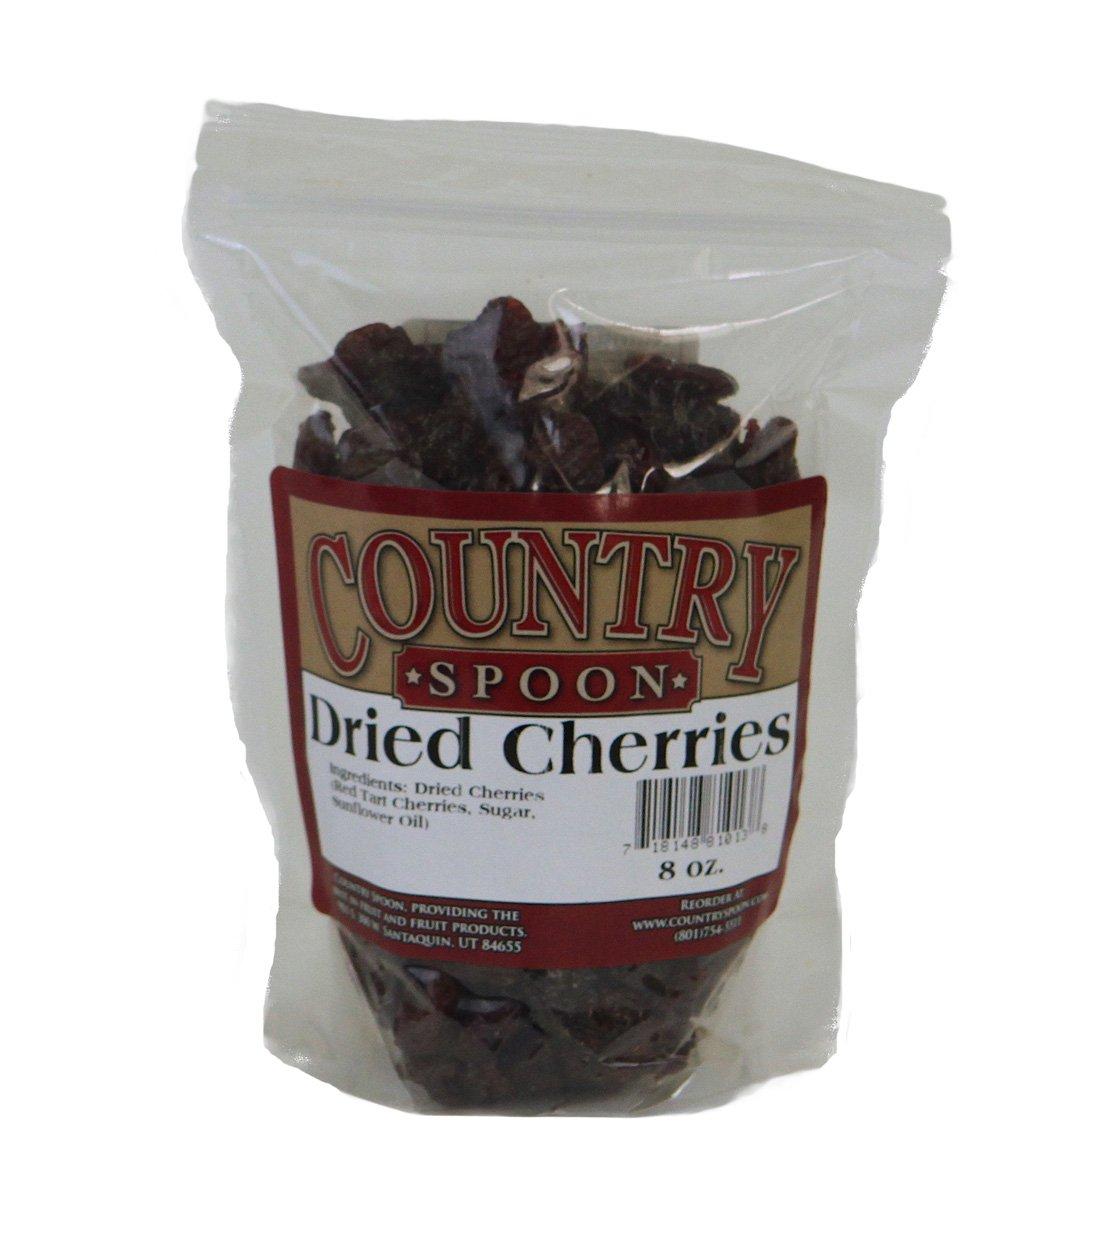 Dried Tart Montmorency Cherries by Country Spoon - 8 oz. Bag